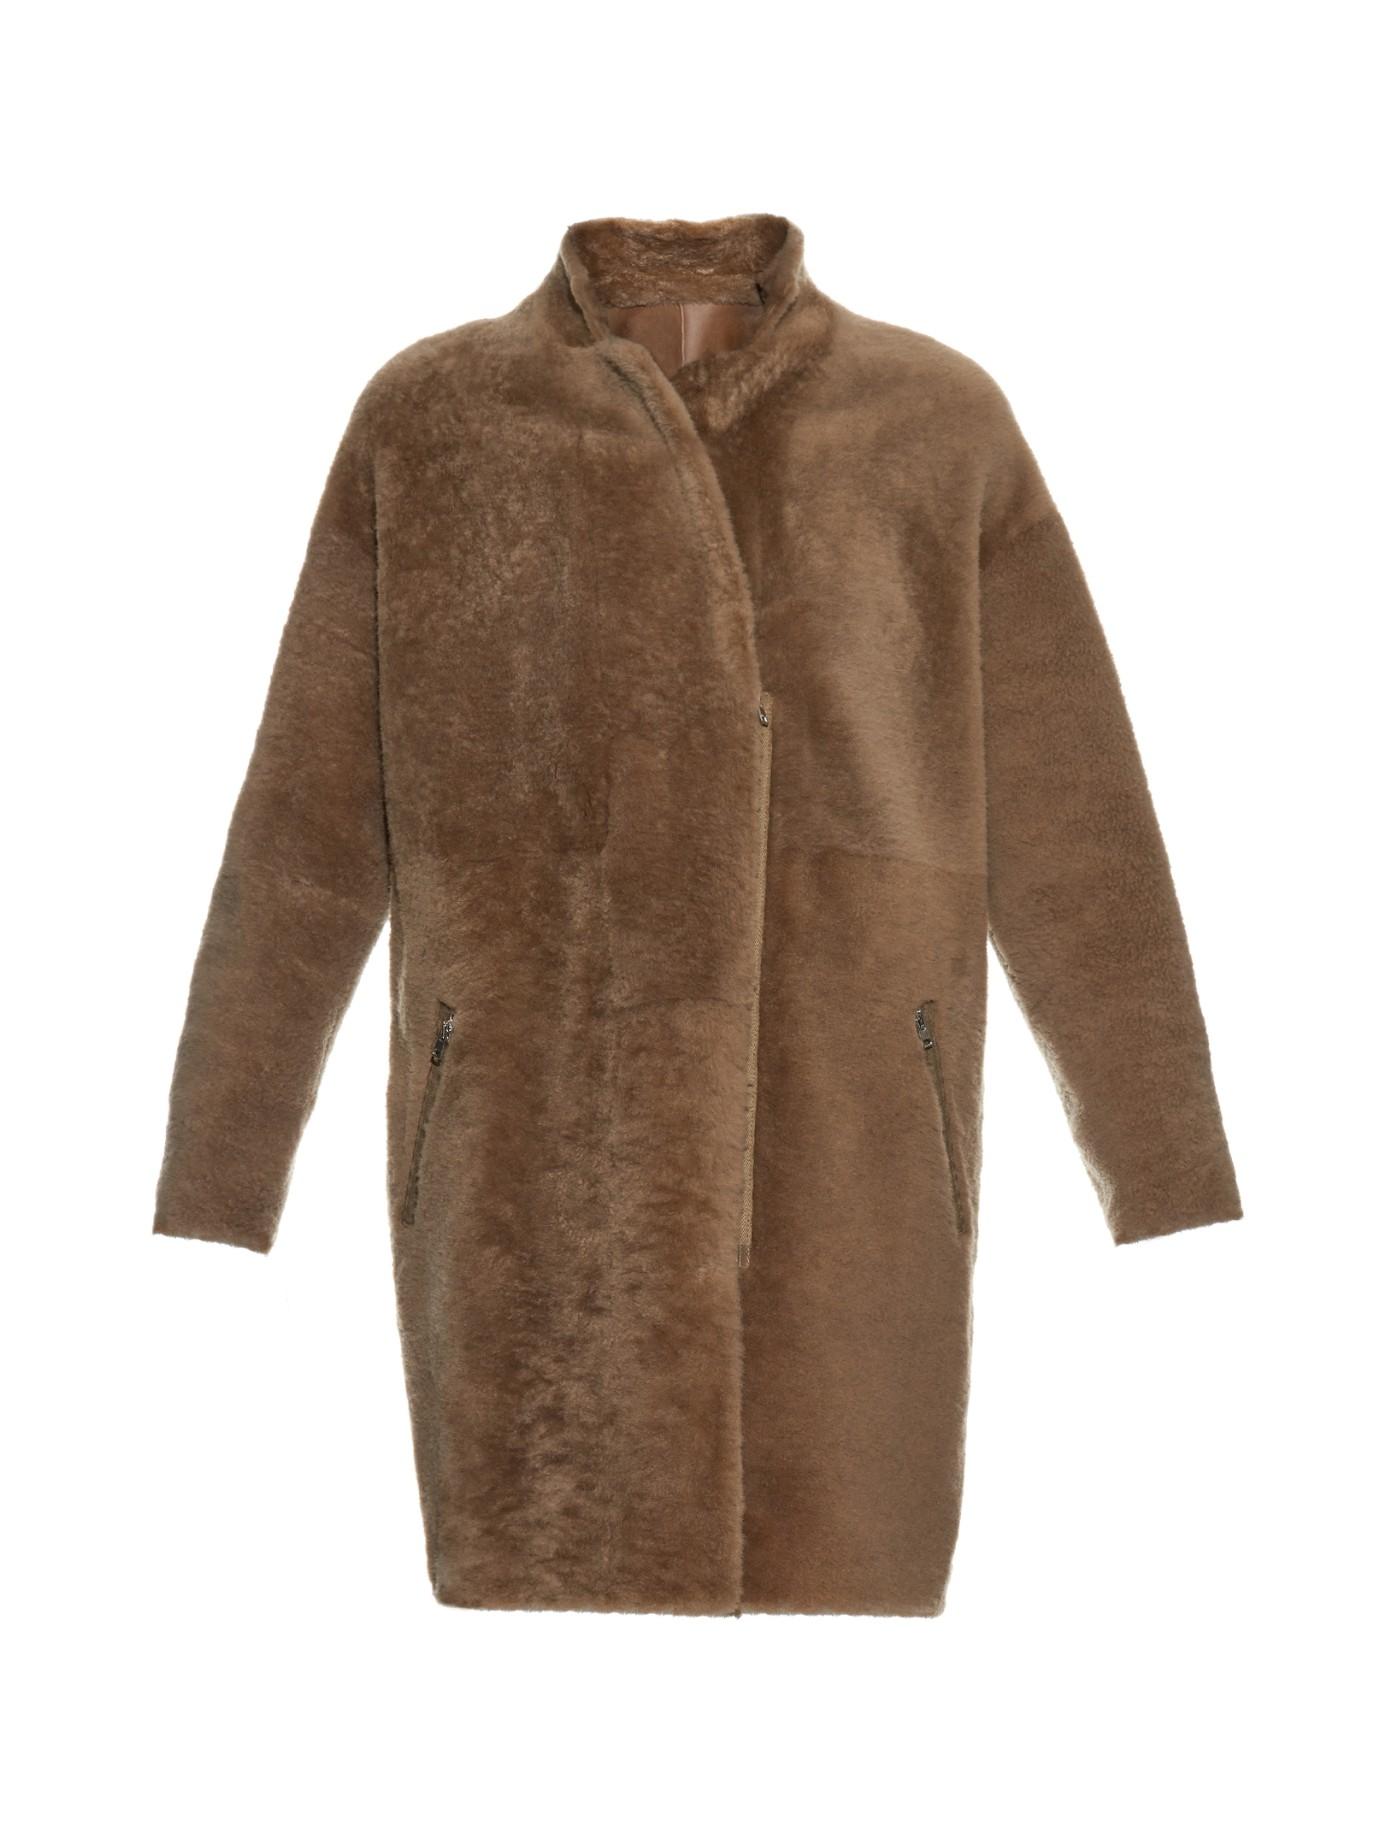 Lyst 32 Paradis Sprung Freres Reversible Shearling Coat